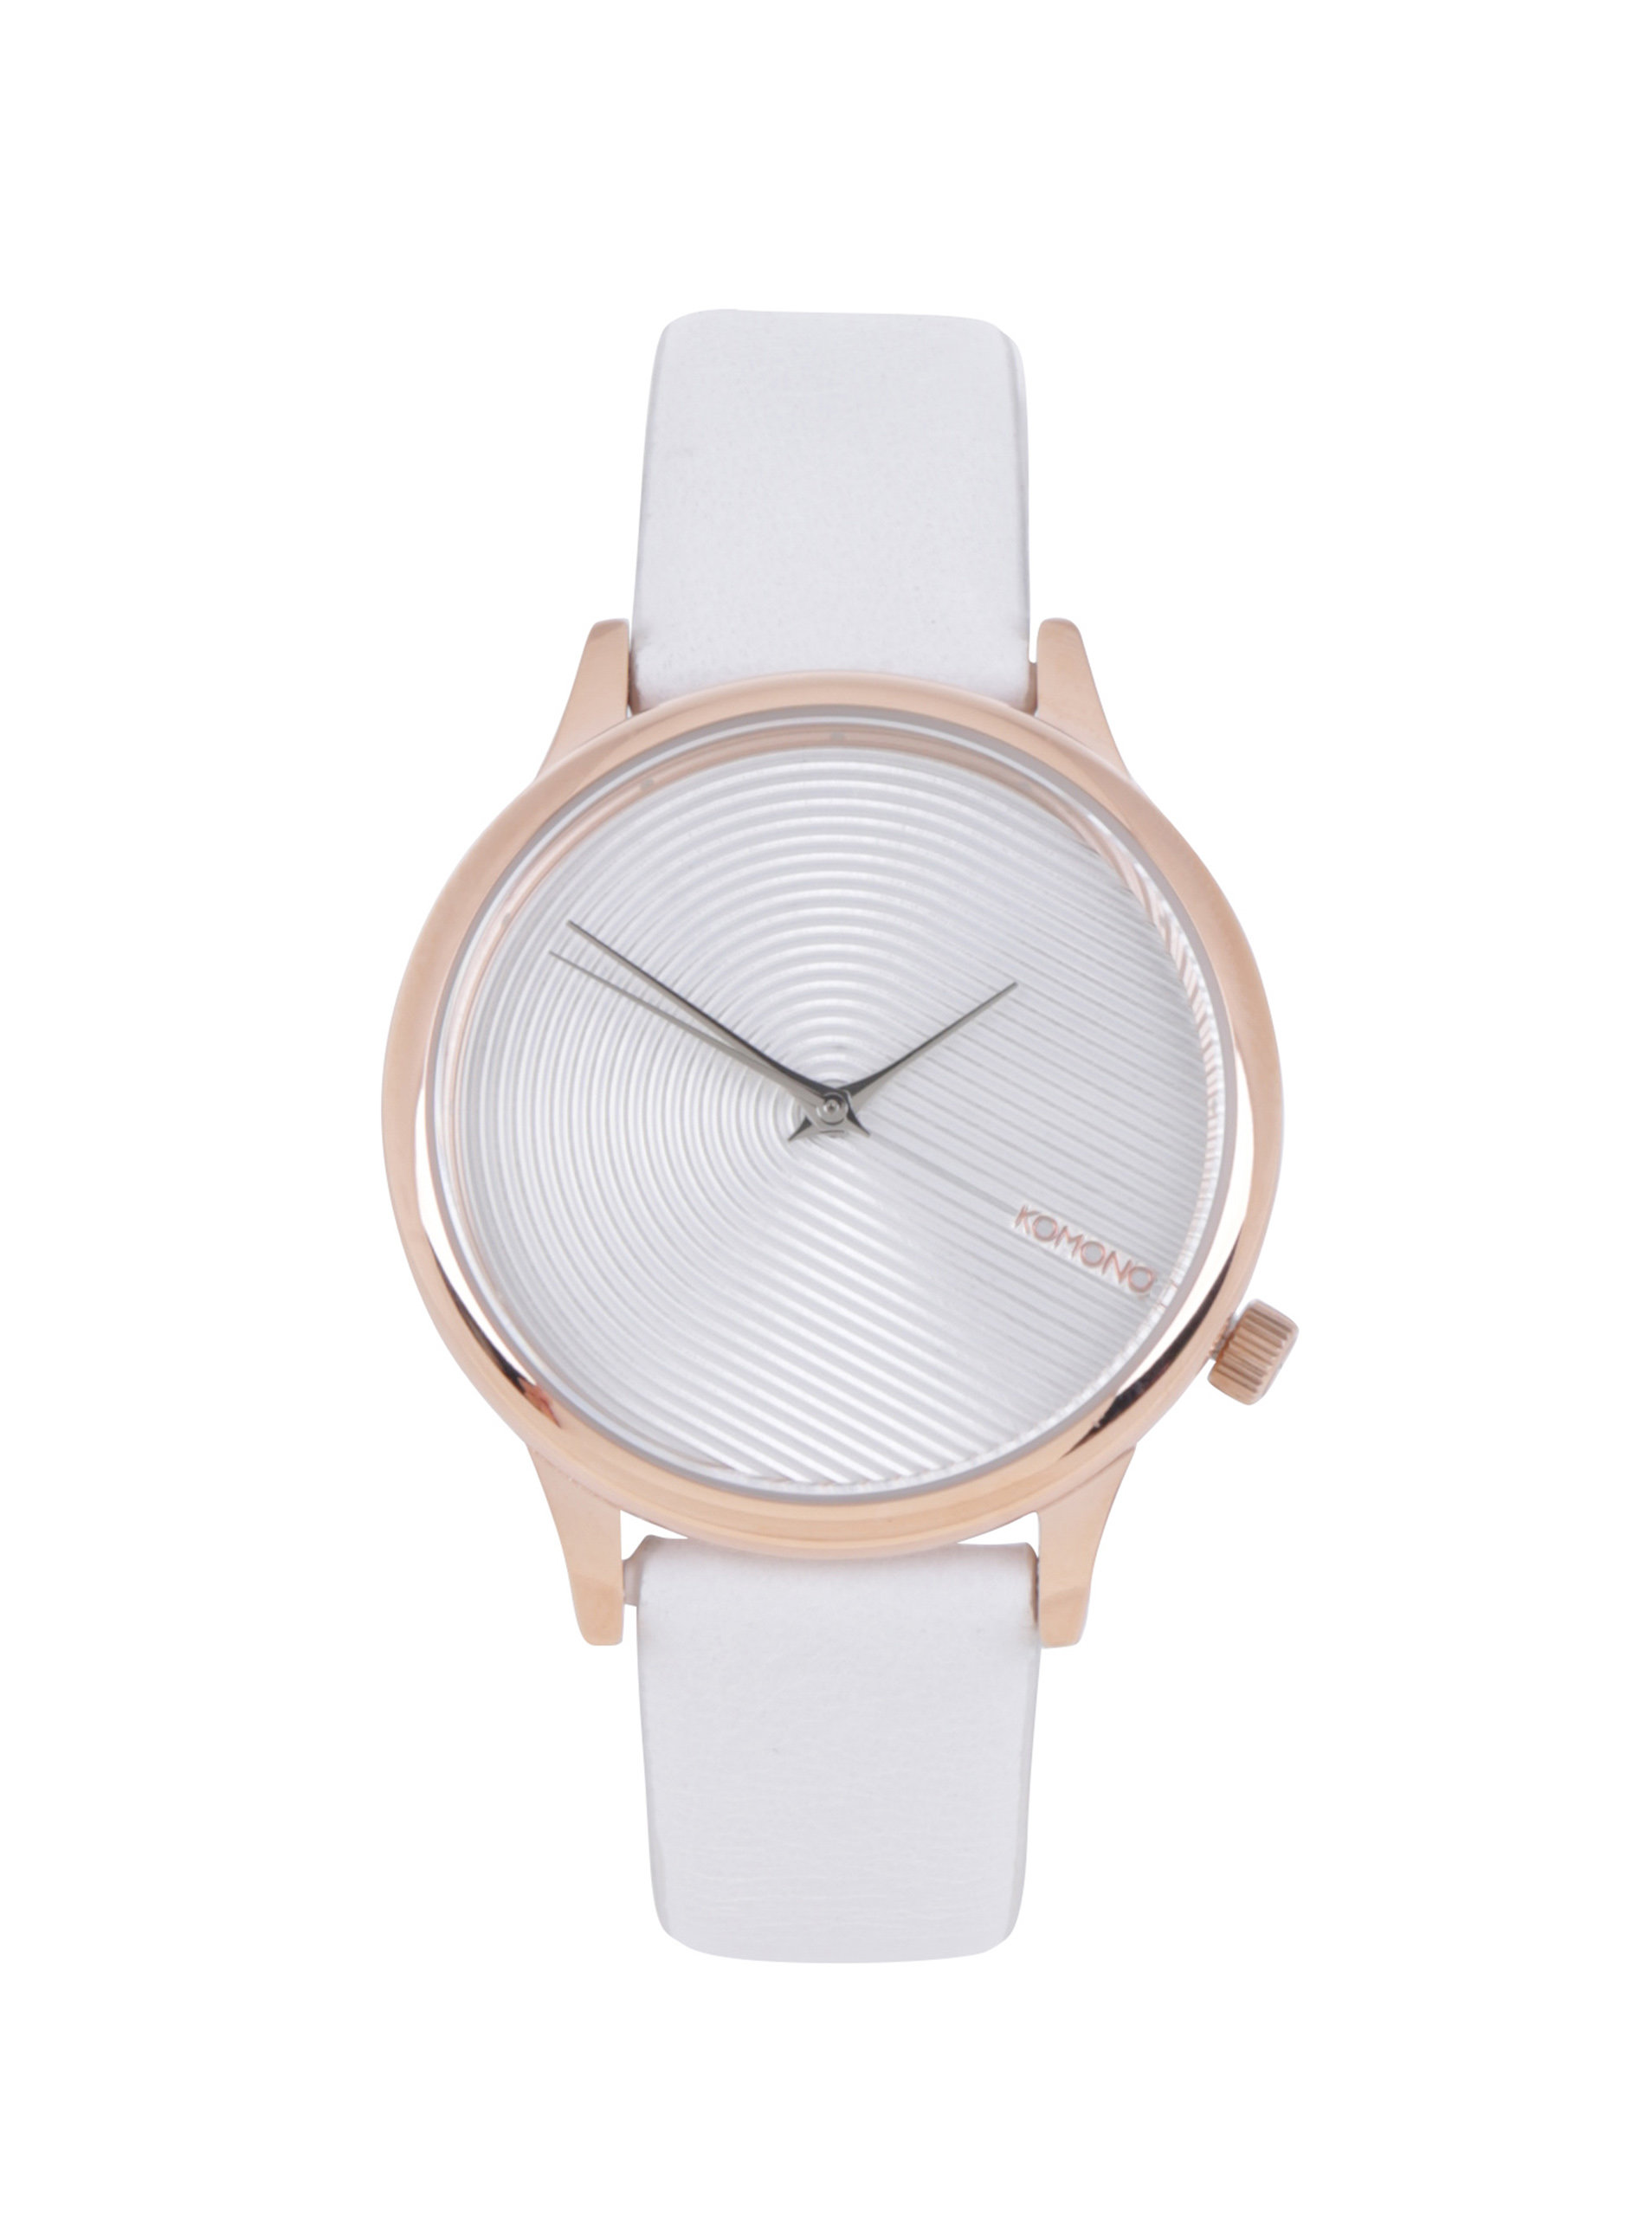 Dámske hodinky s bielym koženým remienkom Komono Estelle Deco ... 0c9b8817bd8